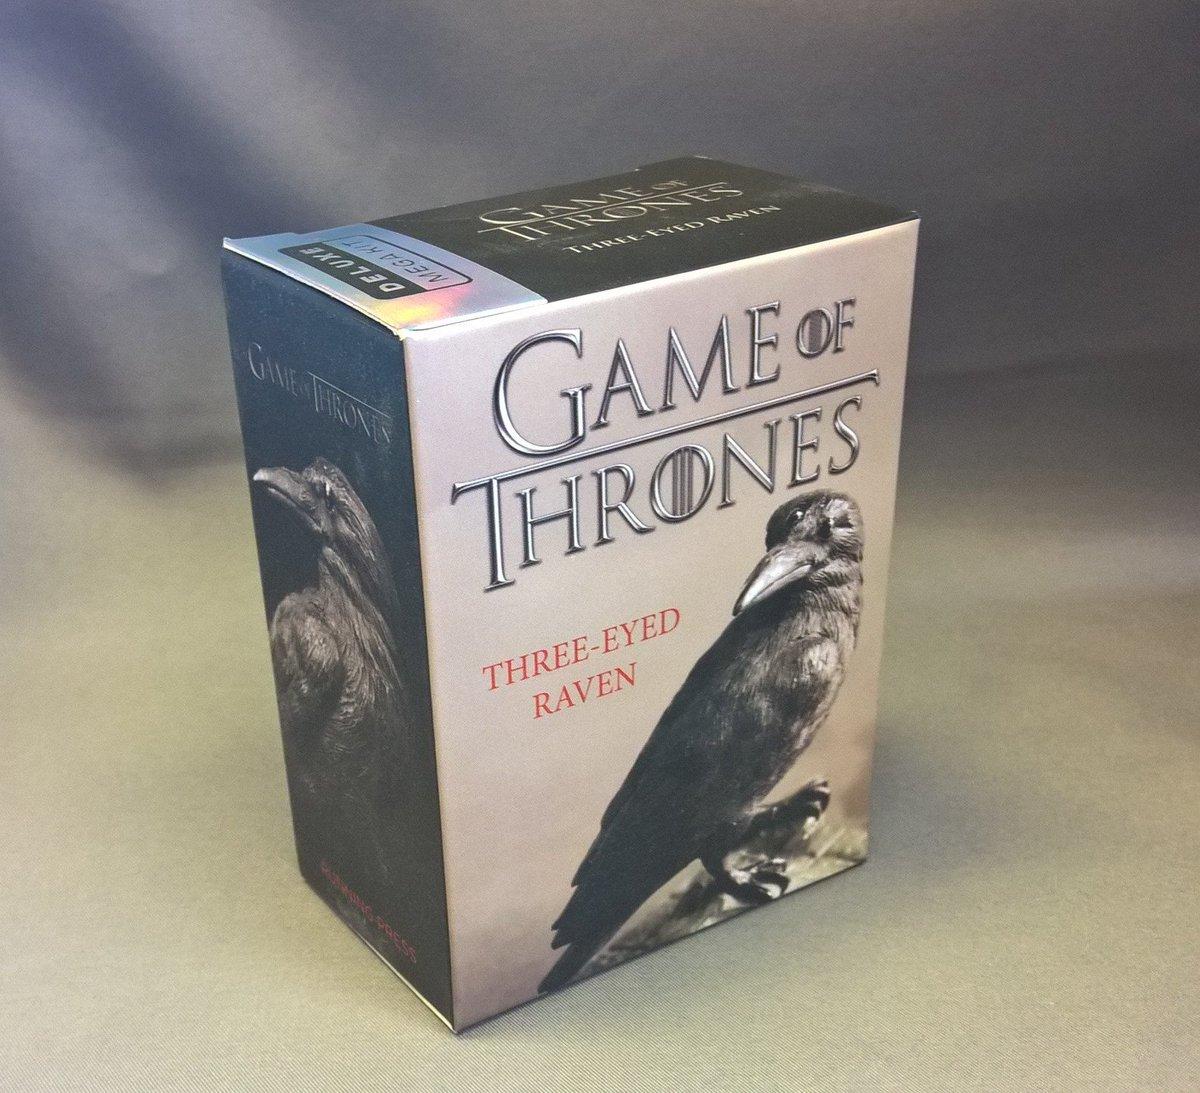 Scottish Bookstore's photo on #GameOfThrones